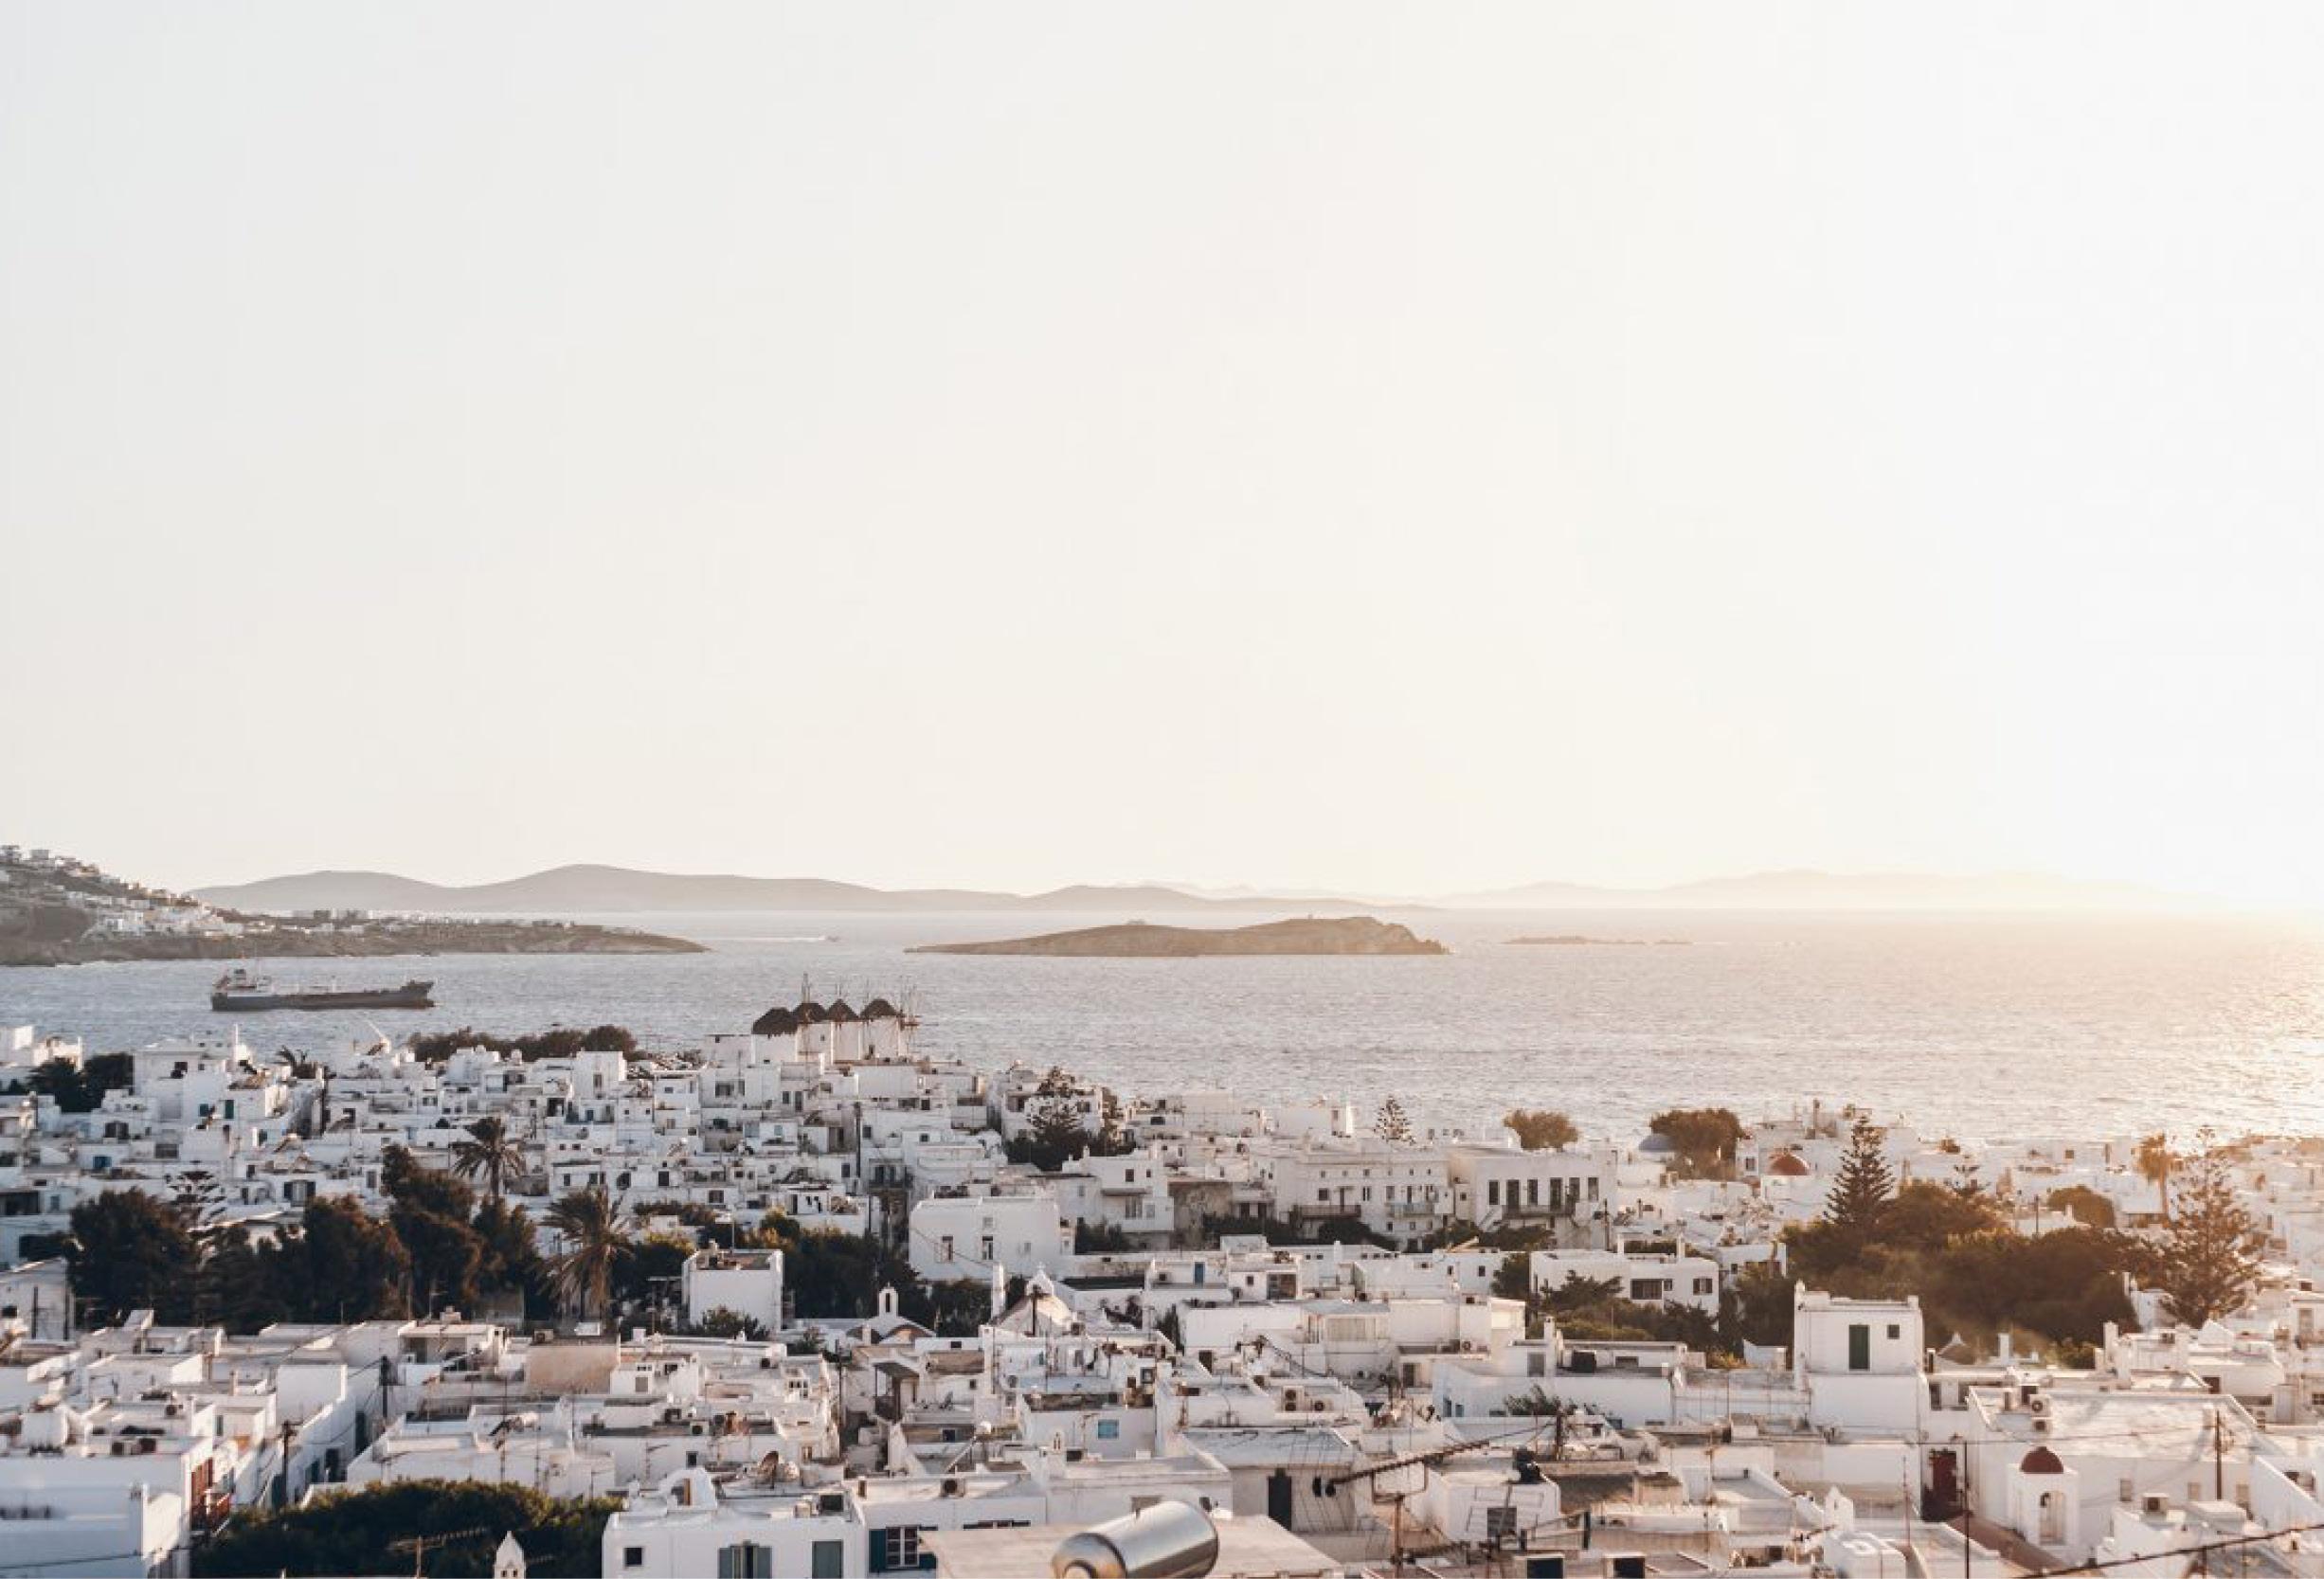 landscape mykonos island architecture greek culture Cycladic heritage